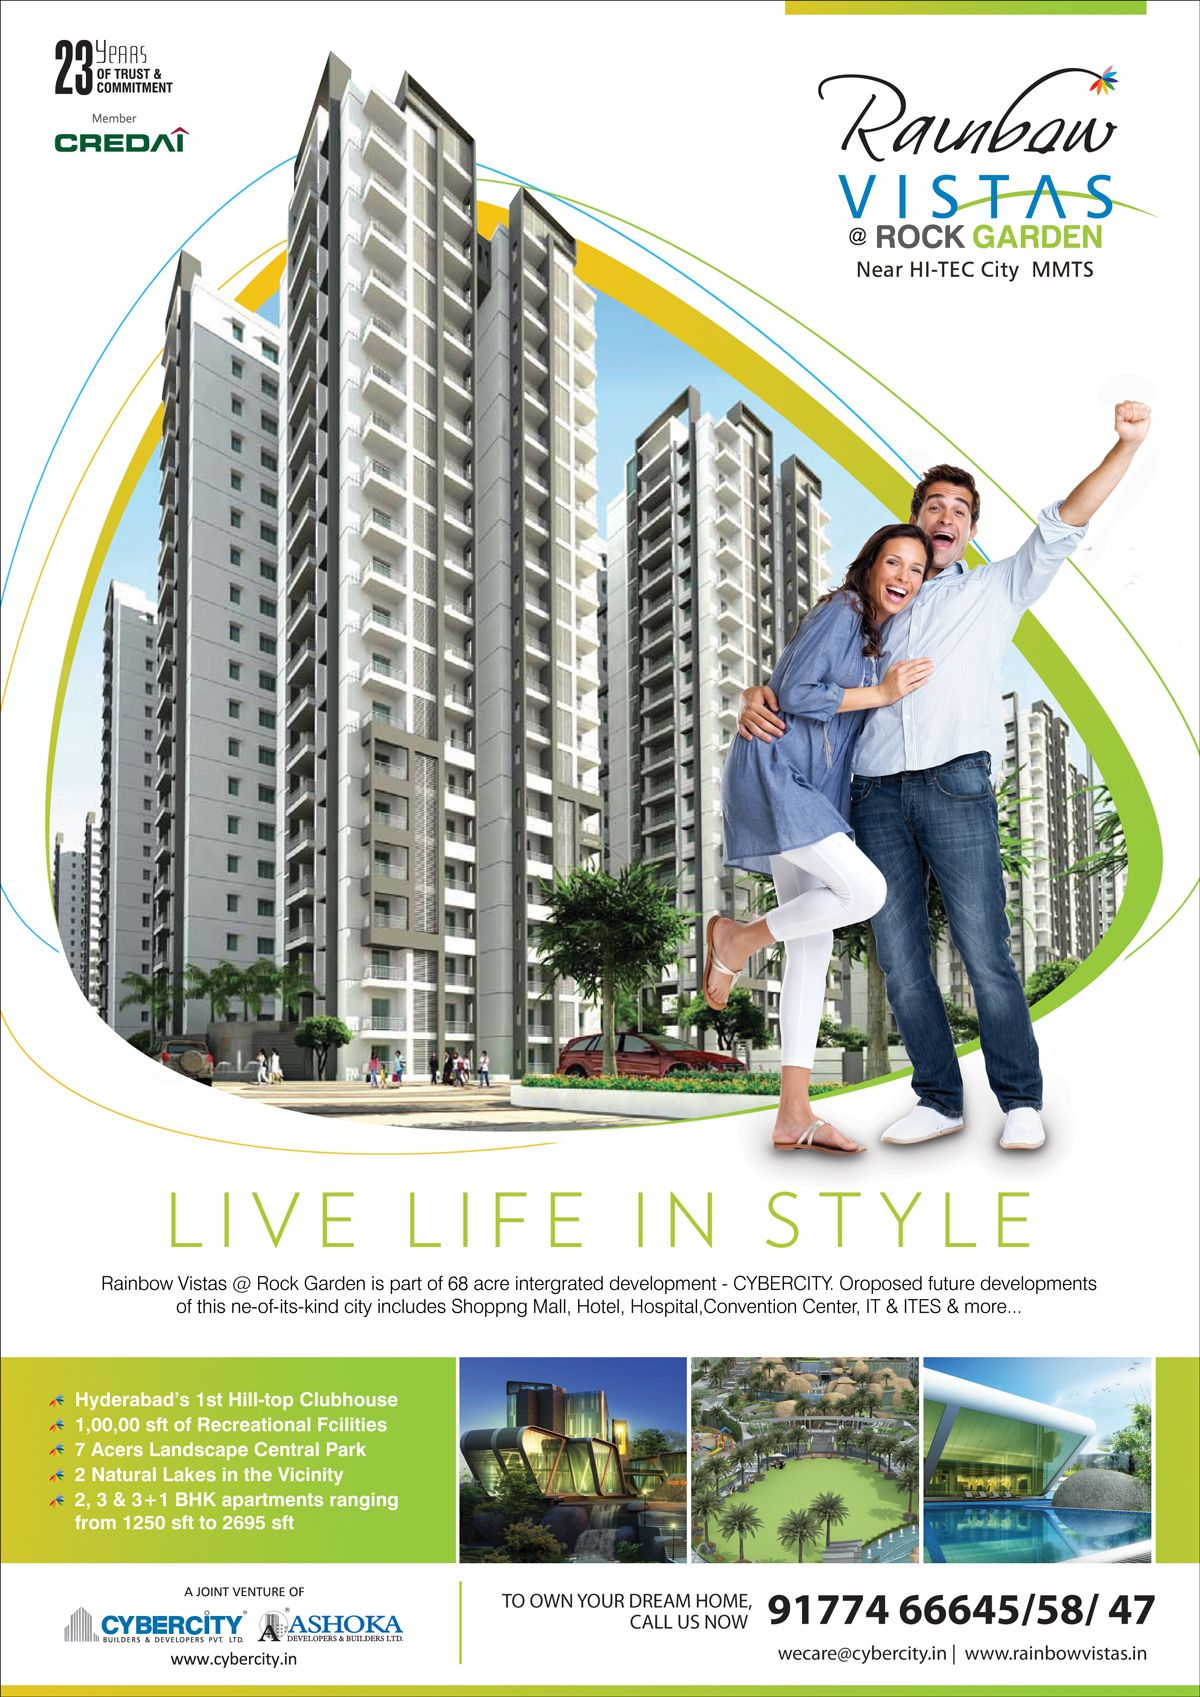 Pin by Saroj Ads - Creative Ad Agency on Advertising